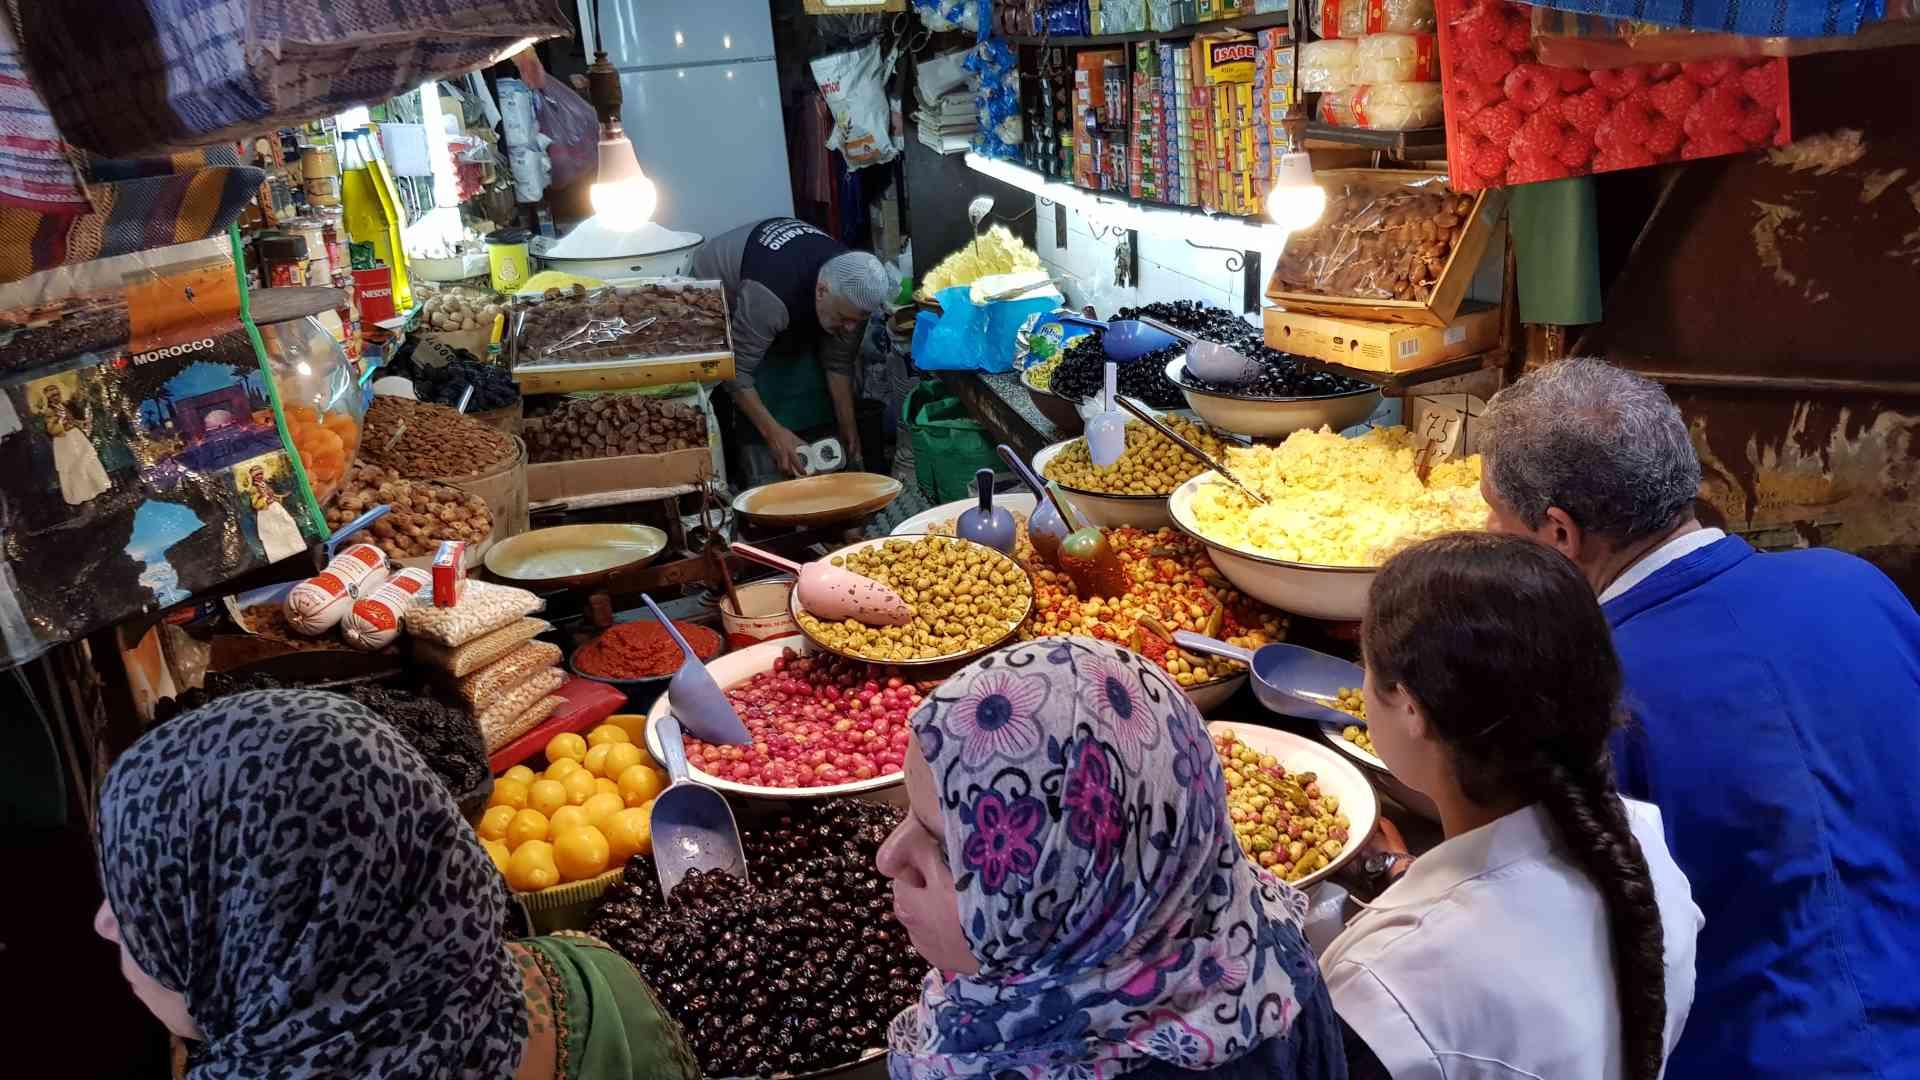 Enjoy Morocco's Colourful Markets